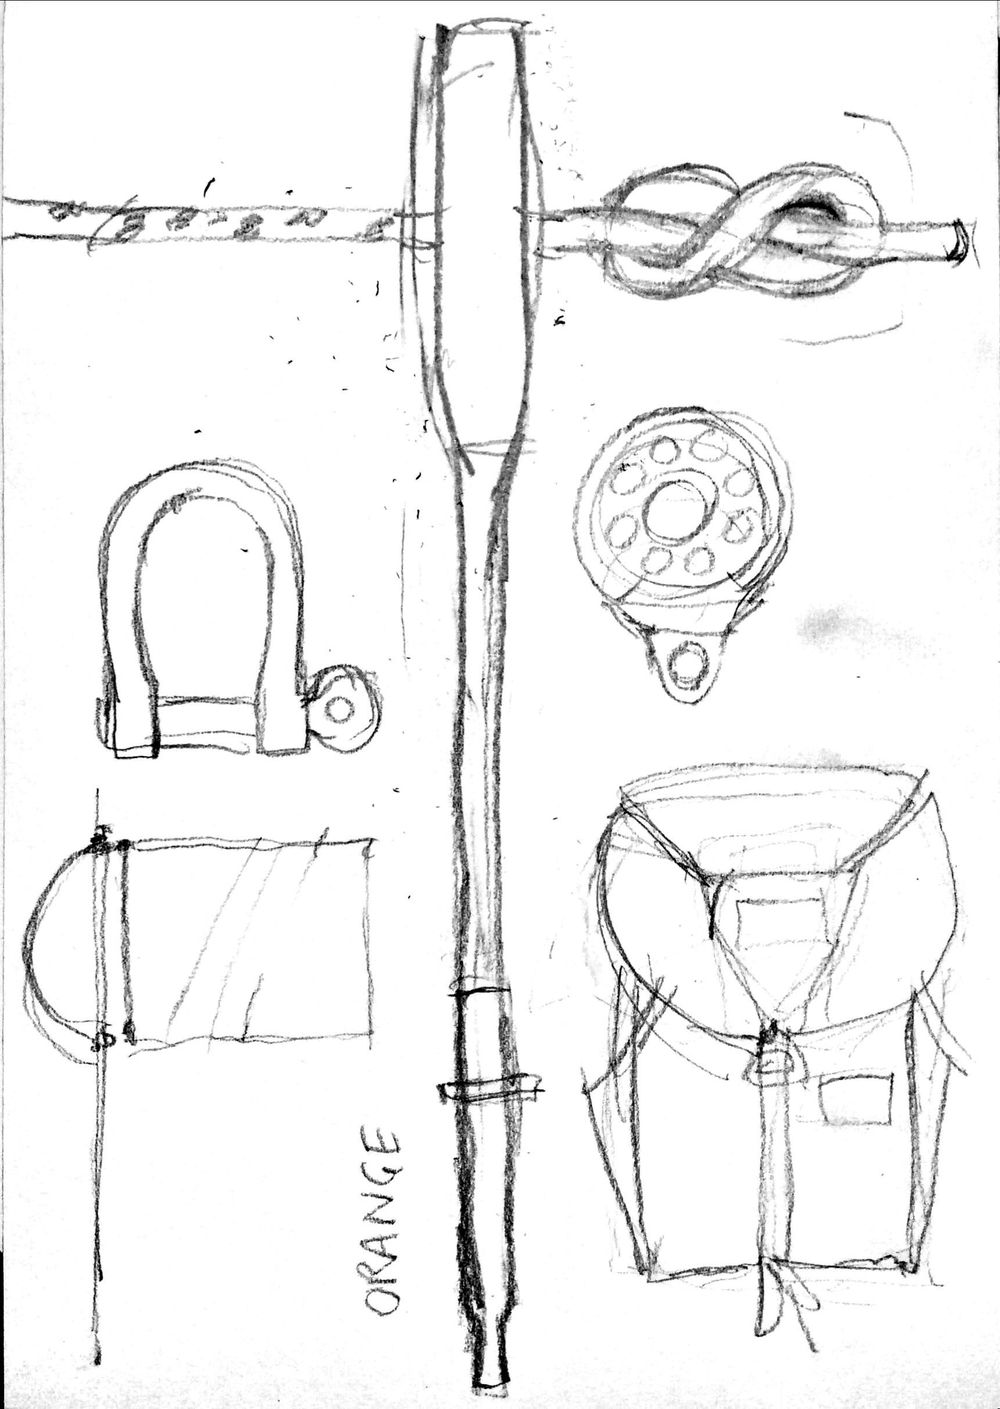 Illustration  dinghy - image 2 - student project